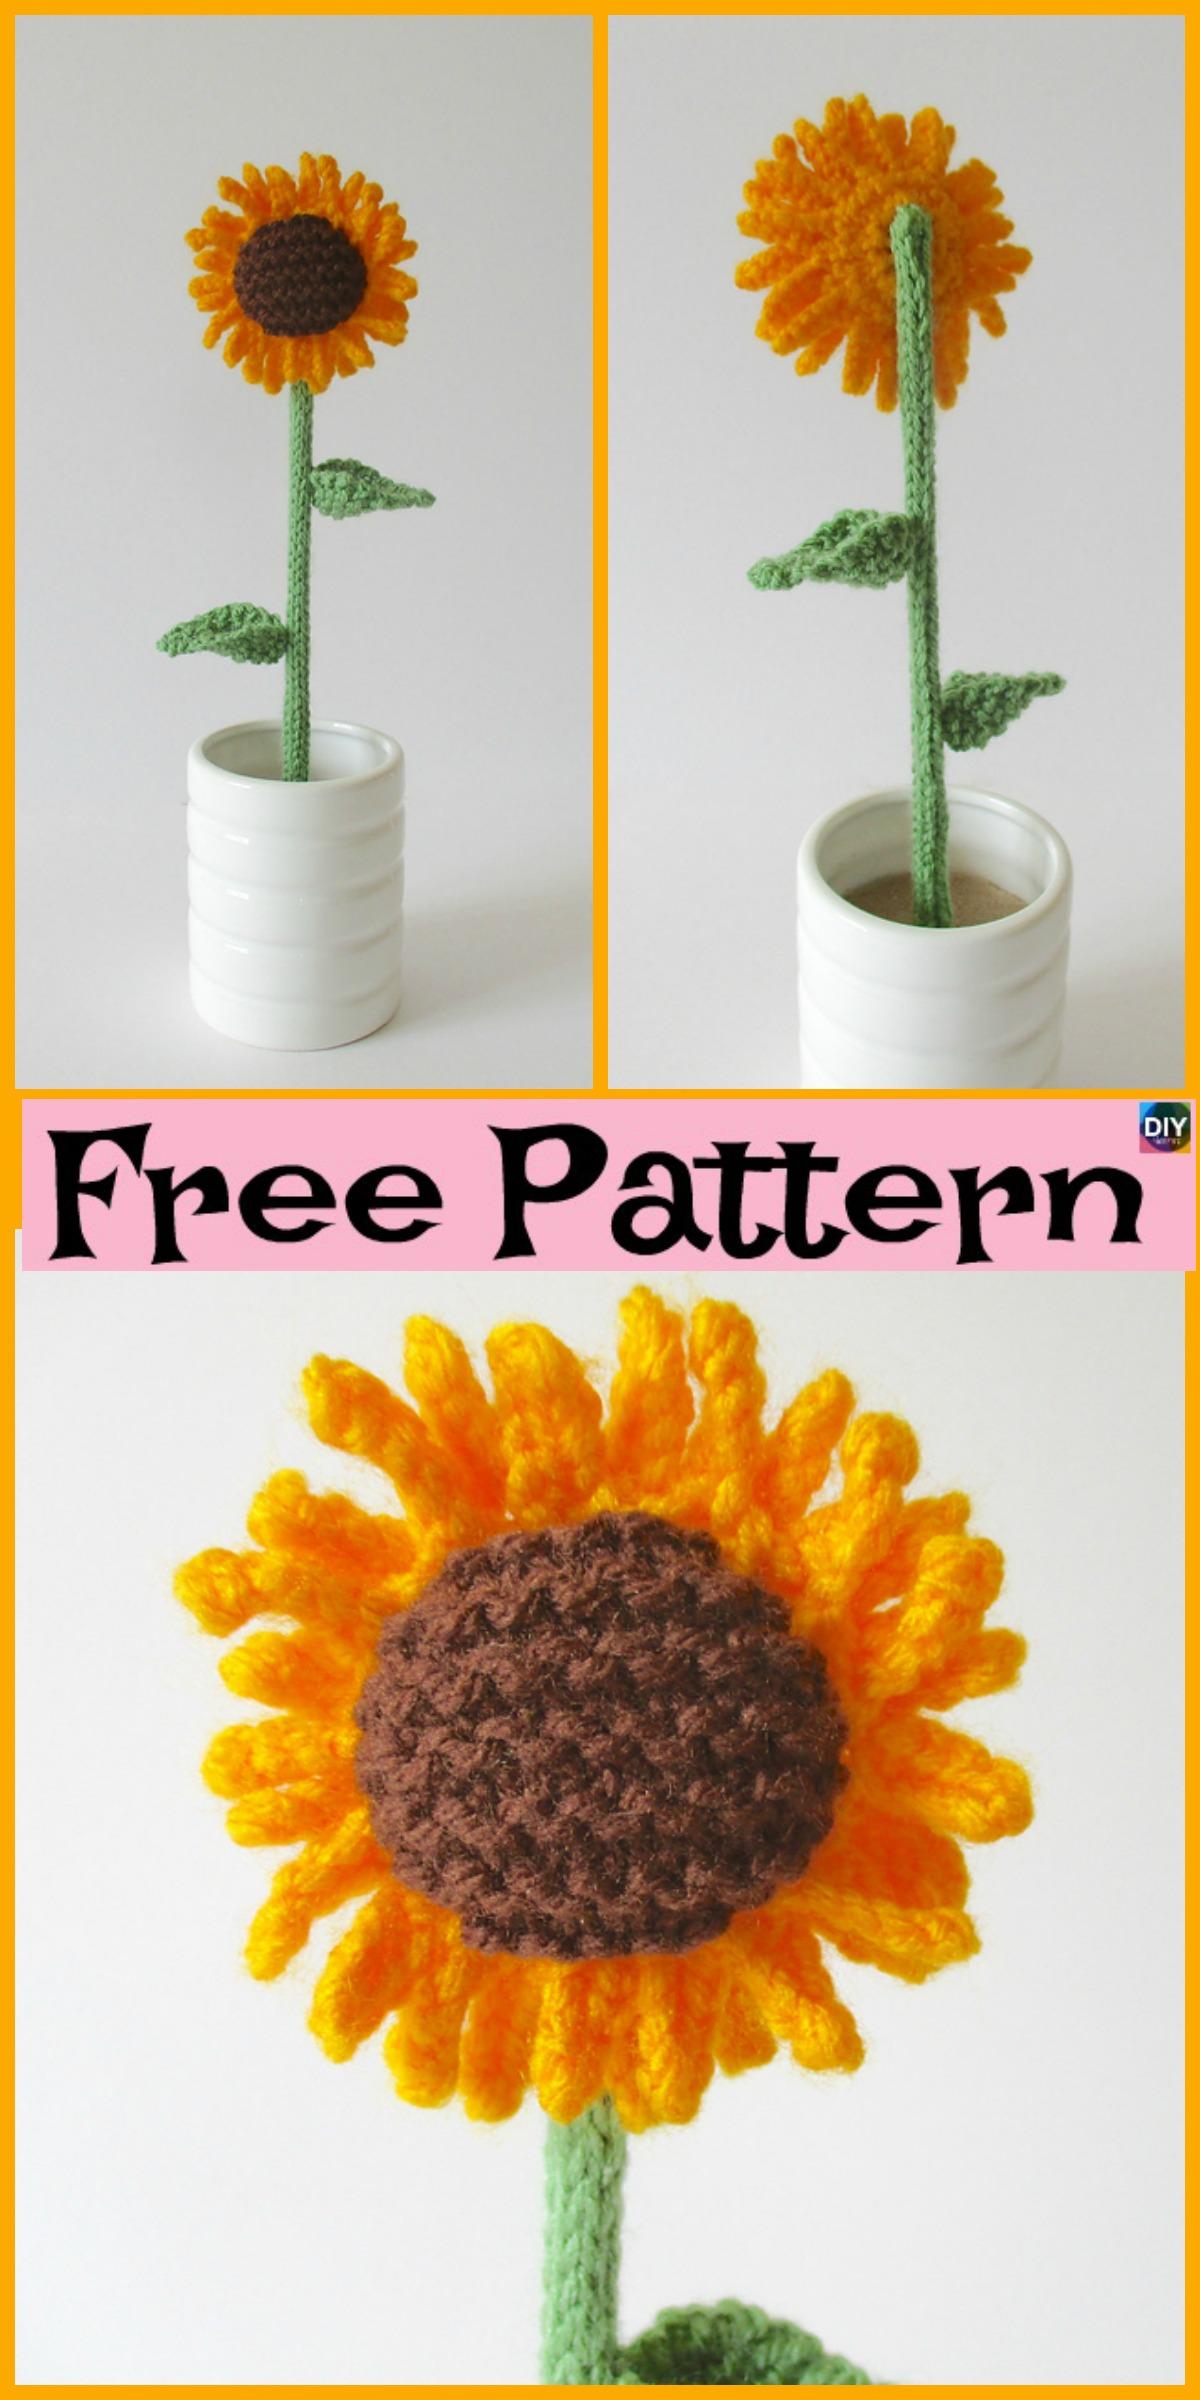 Pretty Knitted Sunflower - Free Pattern